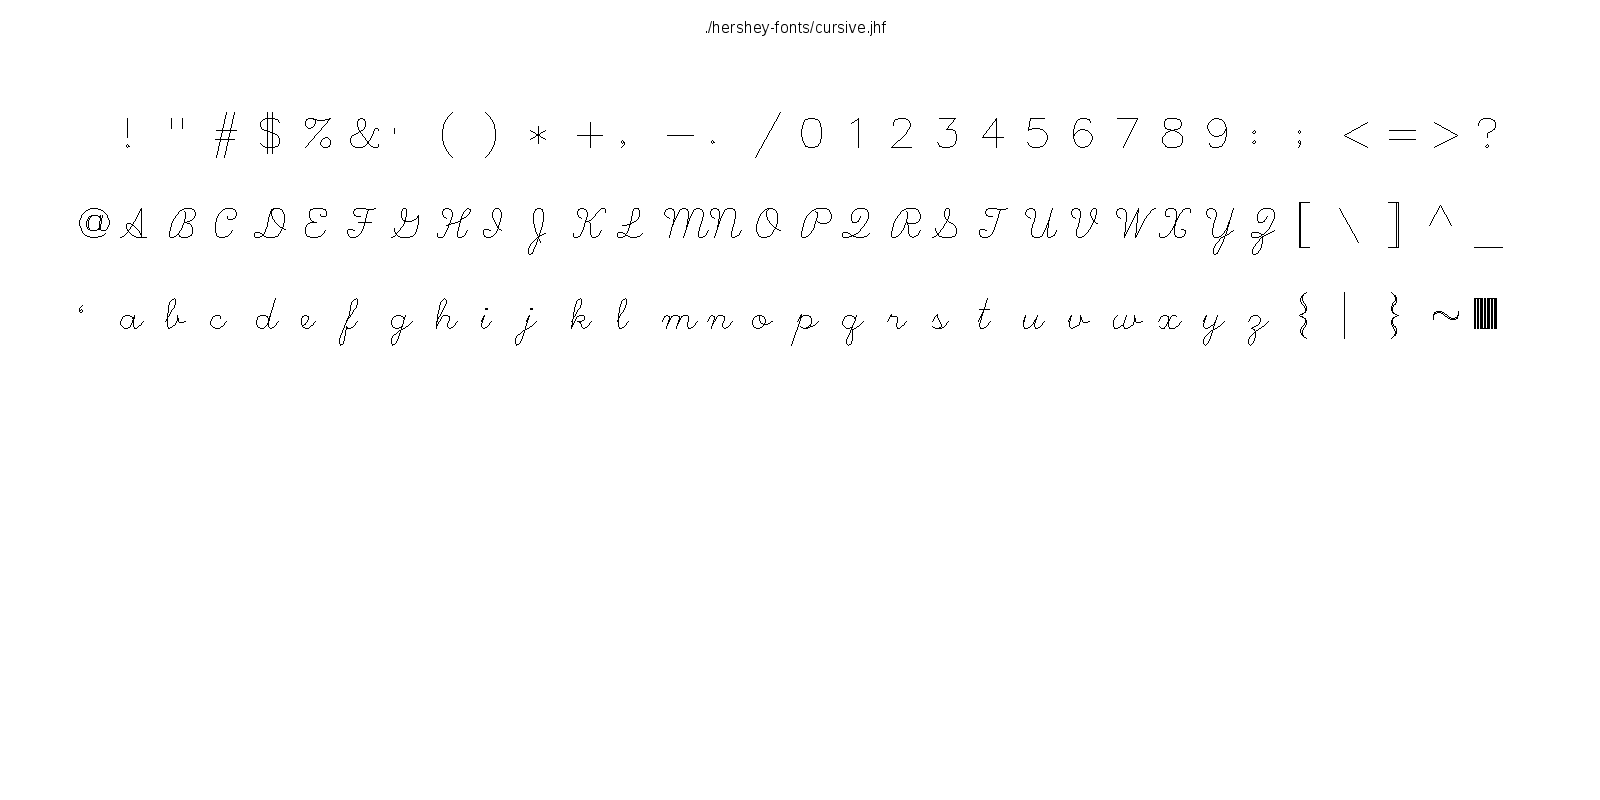 hershey-fonts : libhersheyfont